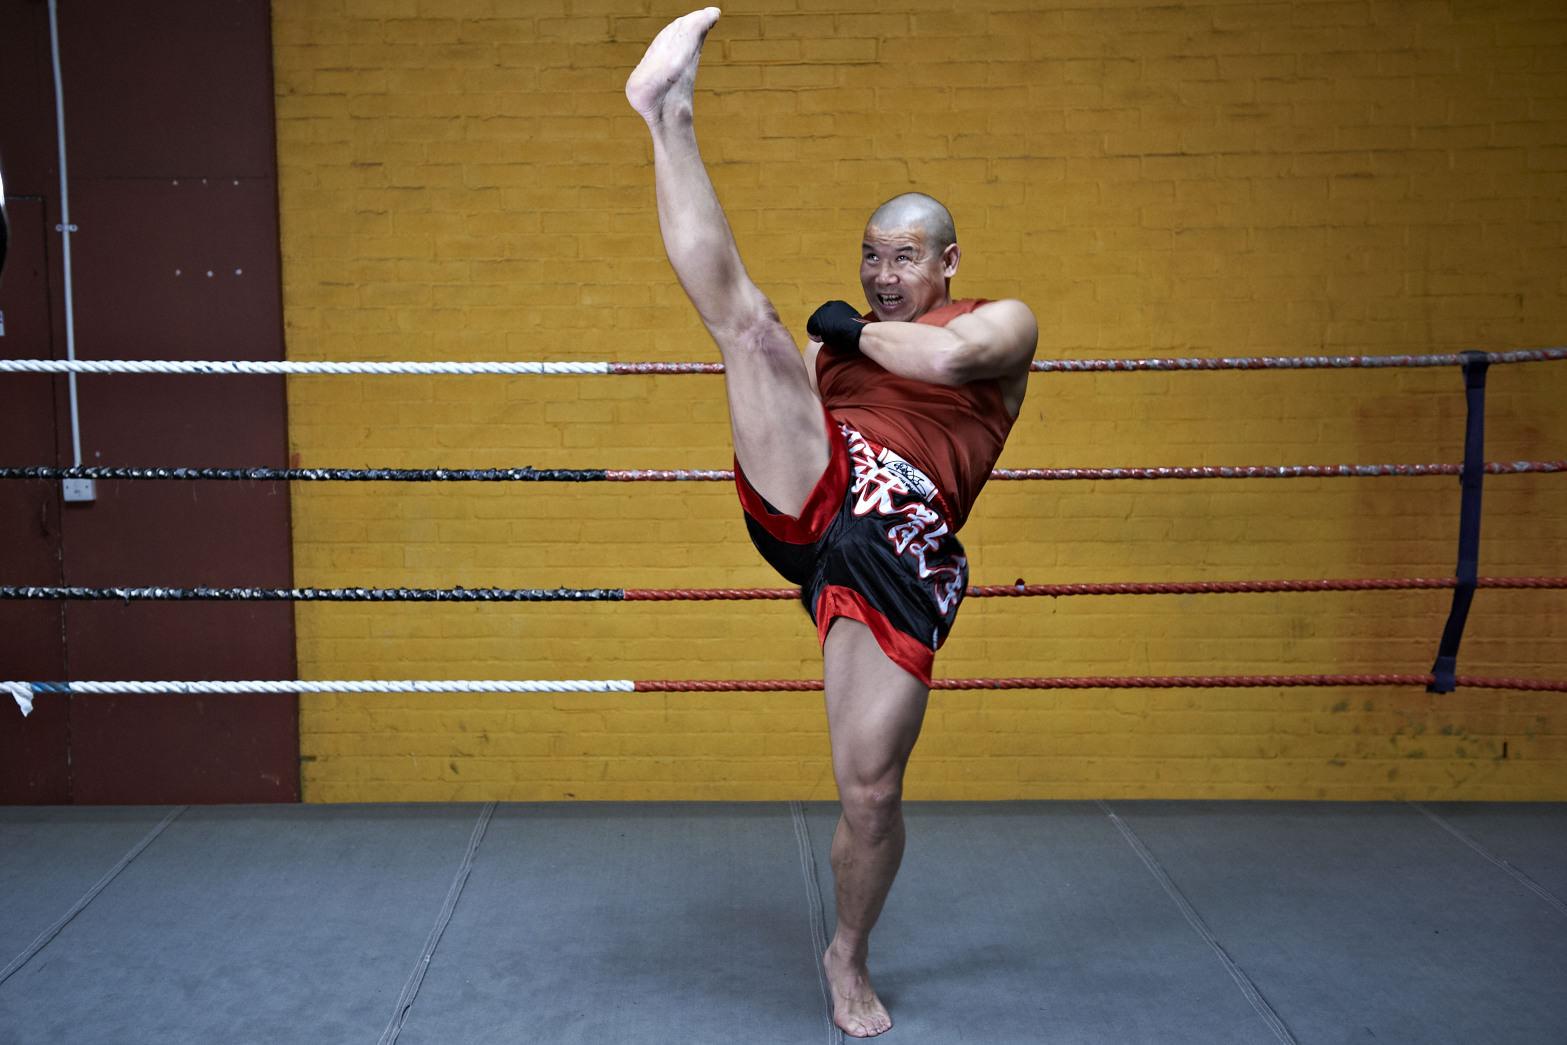 Shaolin temple uk shifu yanzi kick 2.jpg